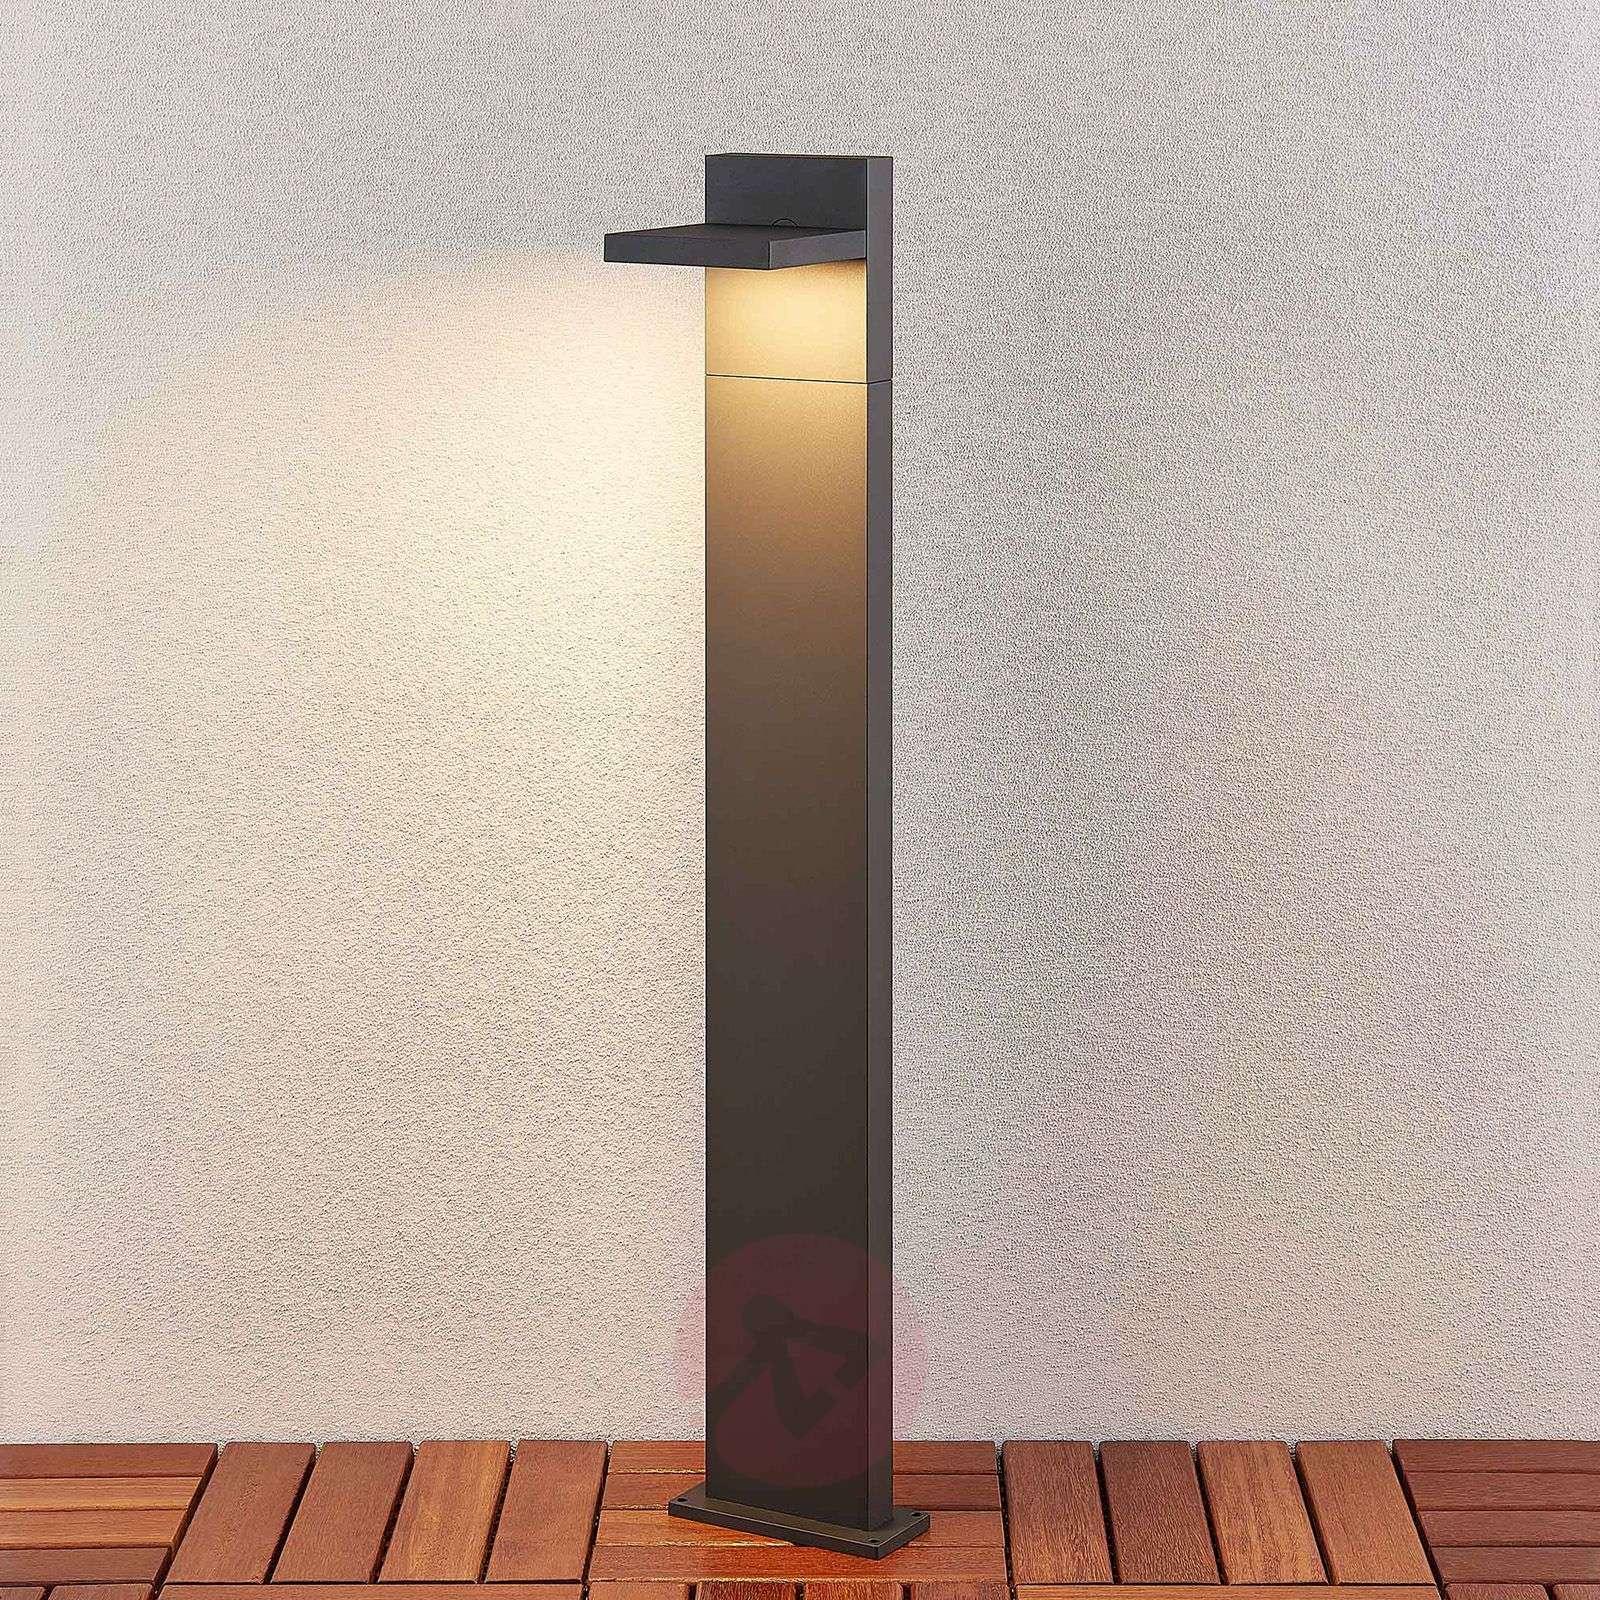 LED-pollarivalaisin Silvan, 100 cm-9619176-01